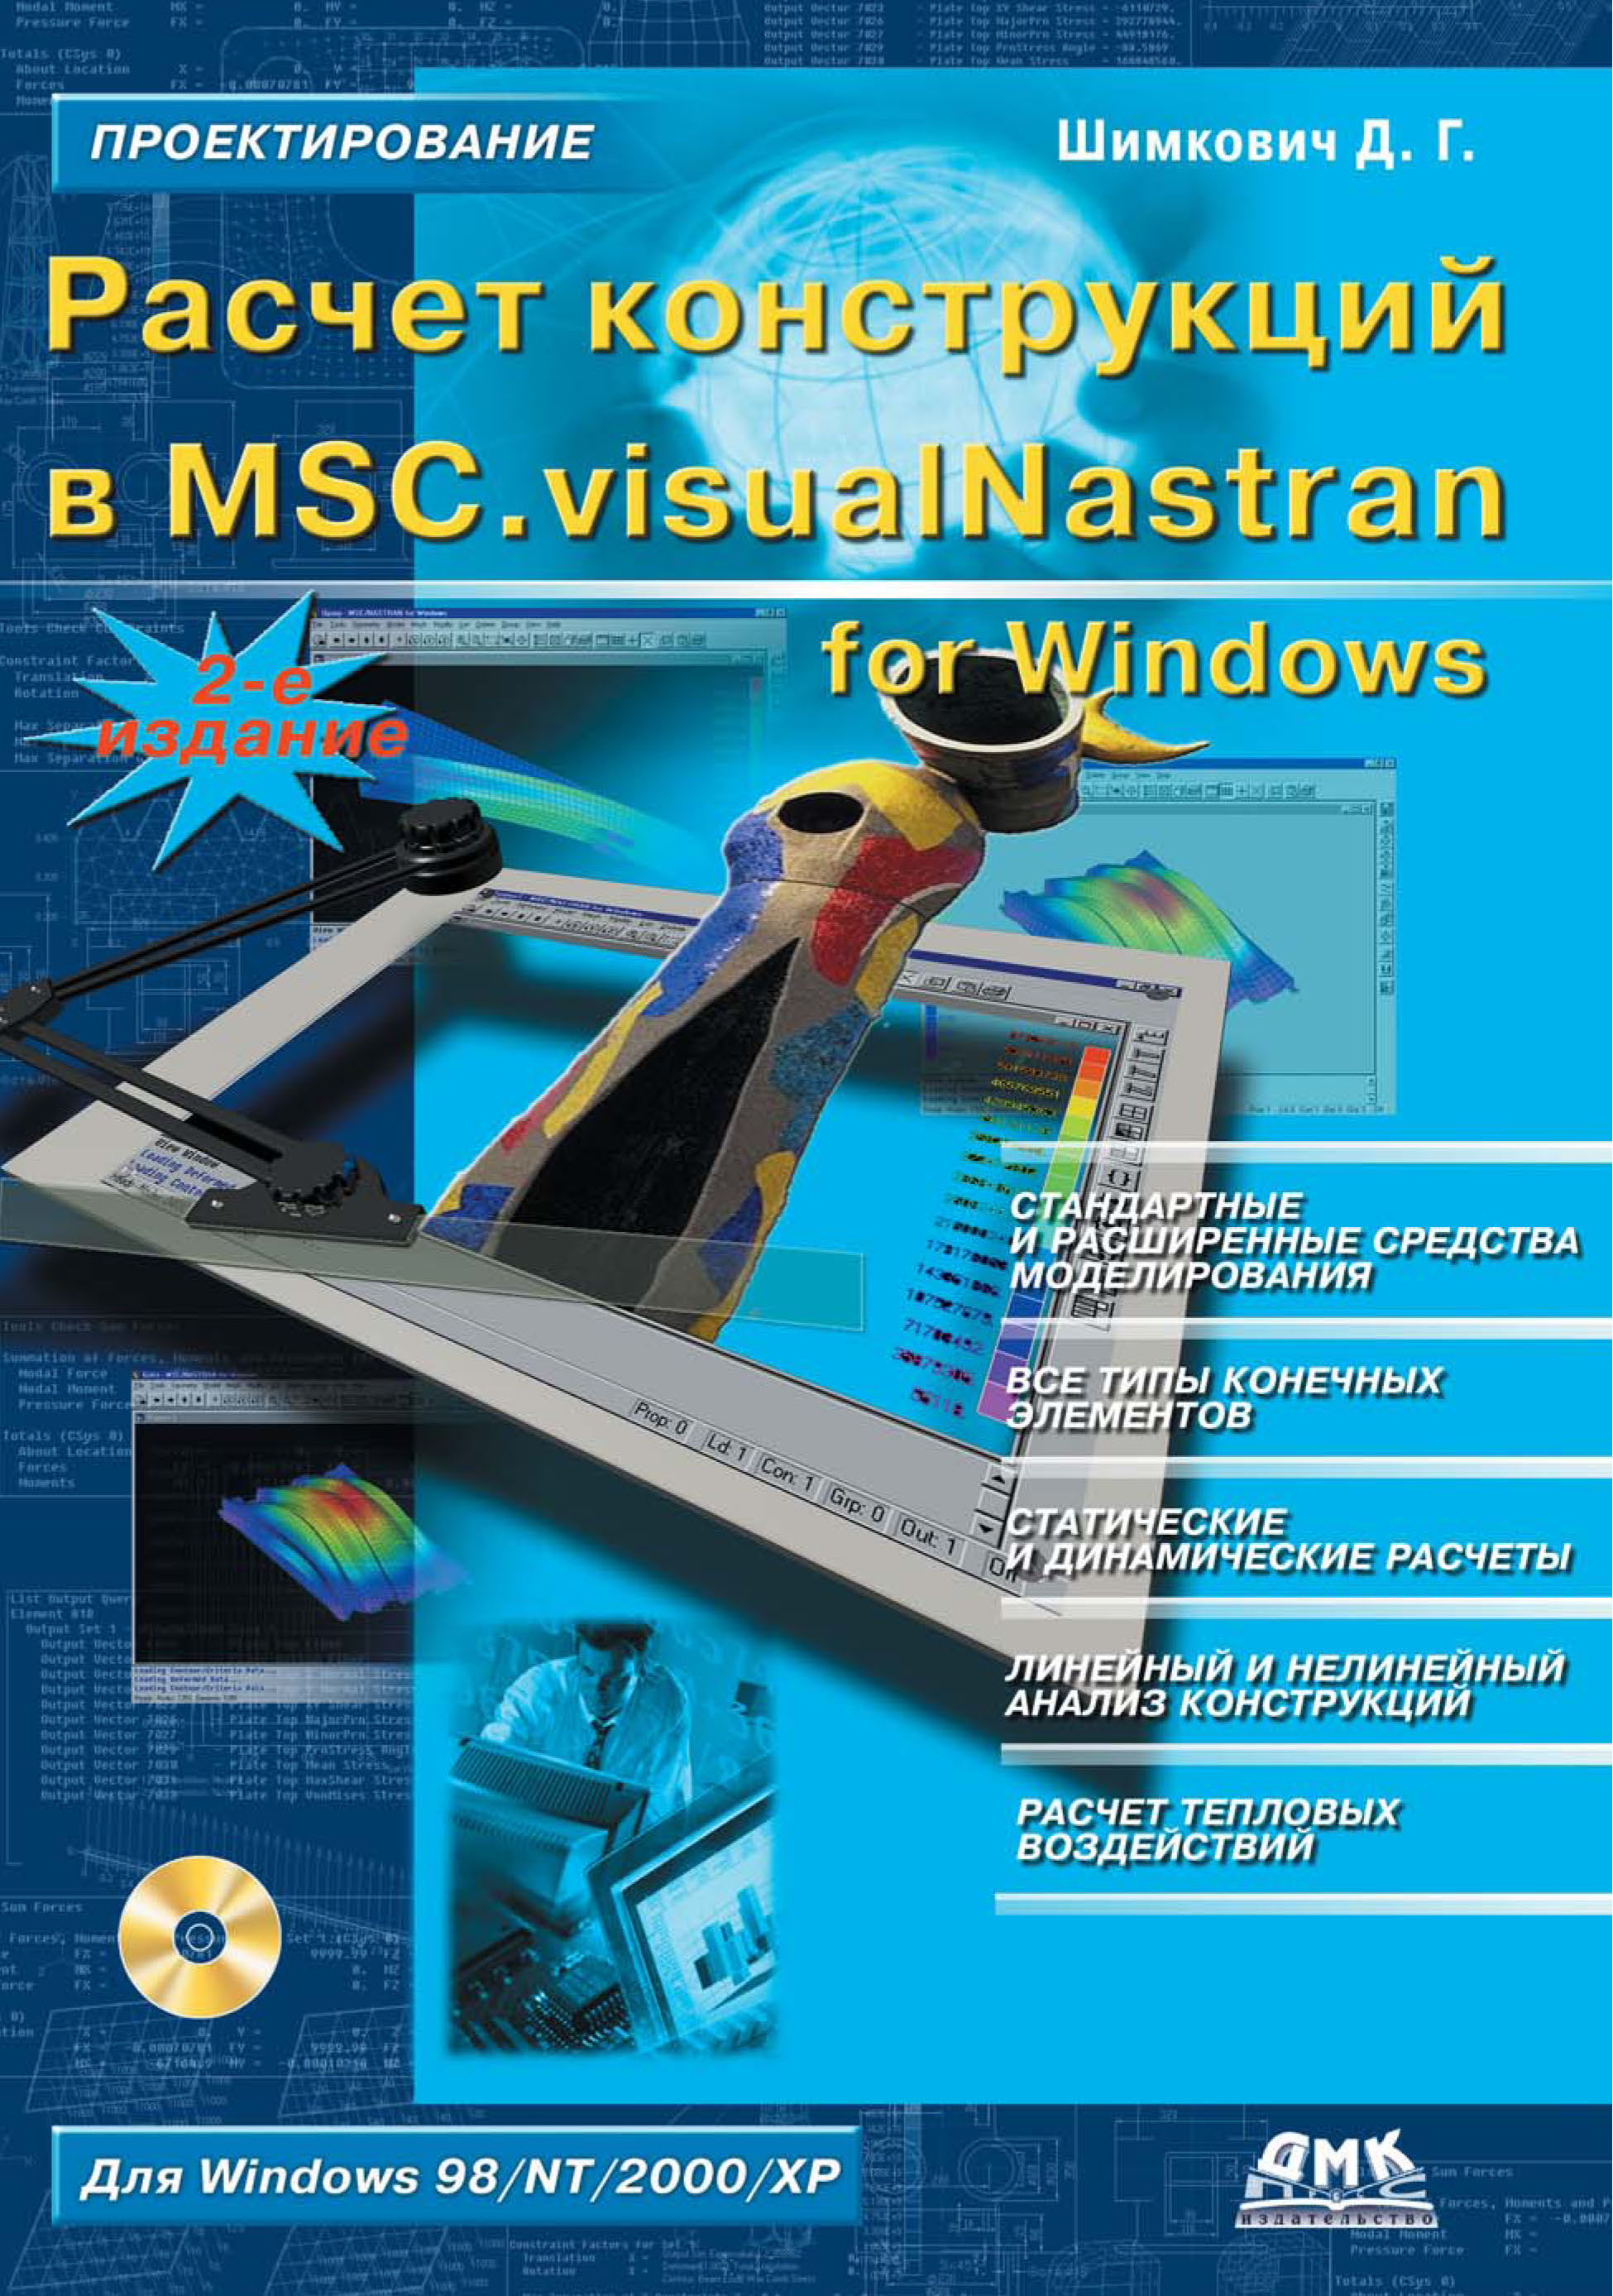 Д. Г. Шимкович Расчет конструкций в MSC.visualNastran for Windows цена